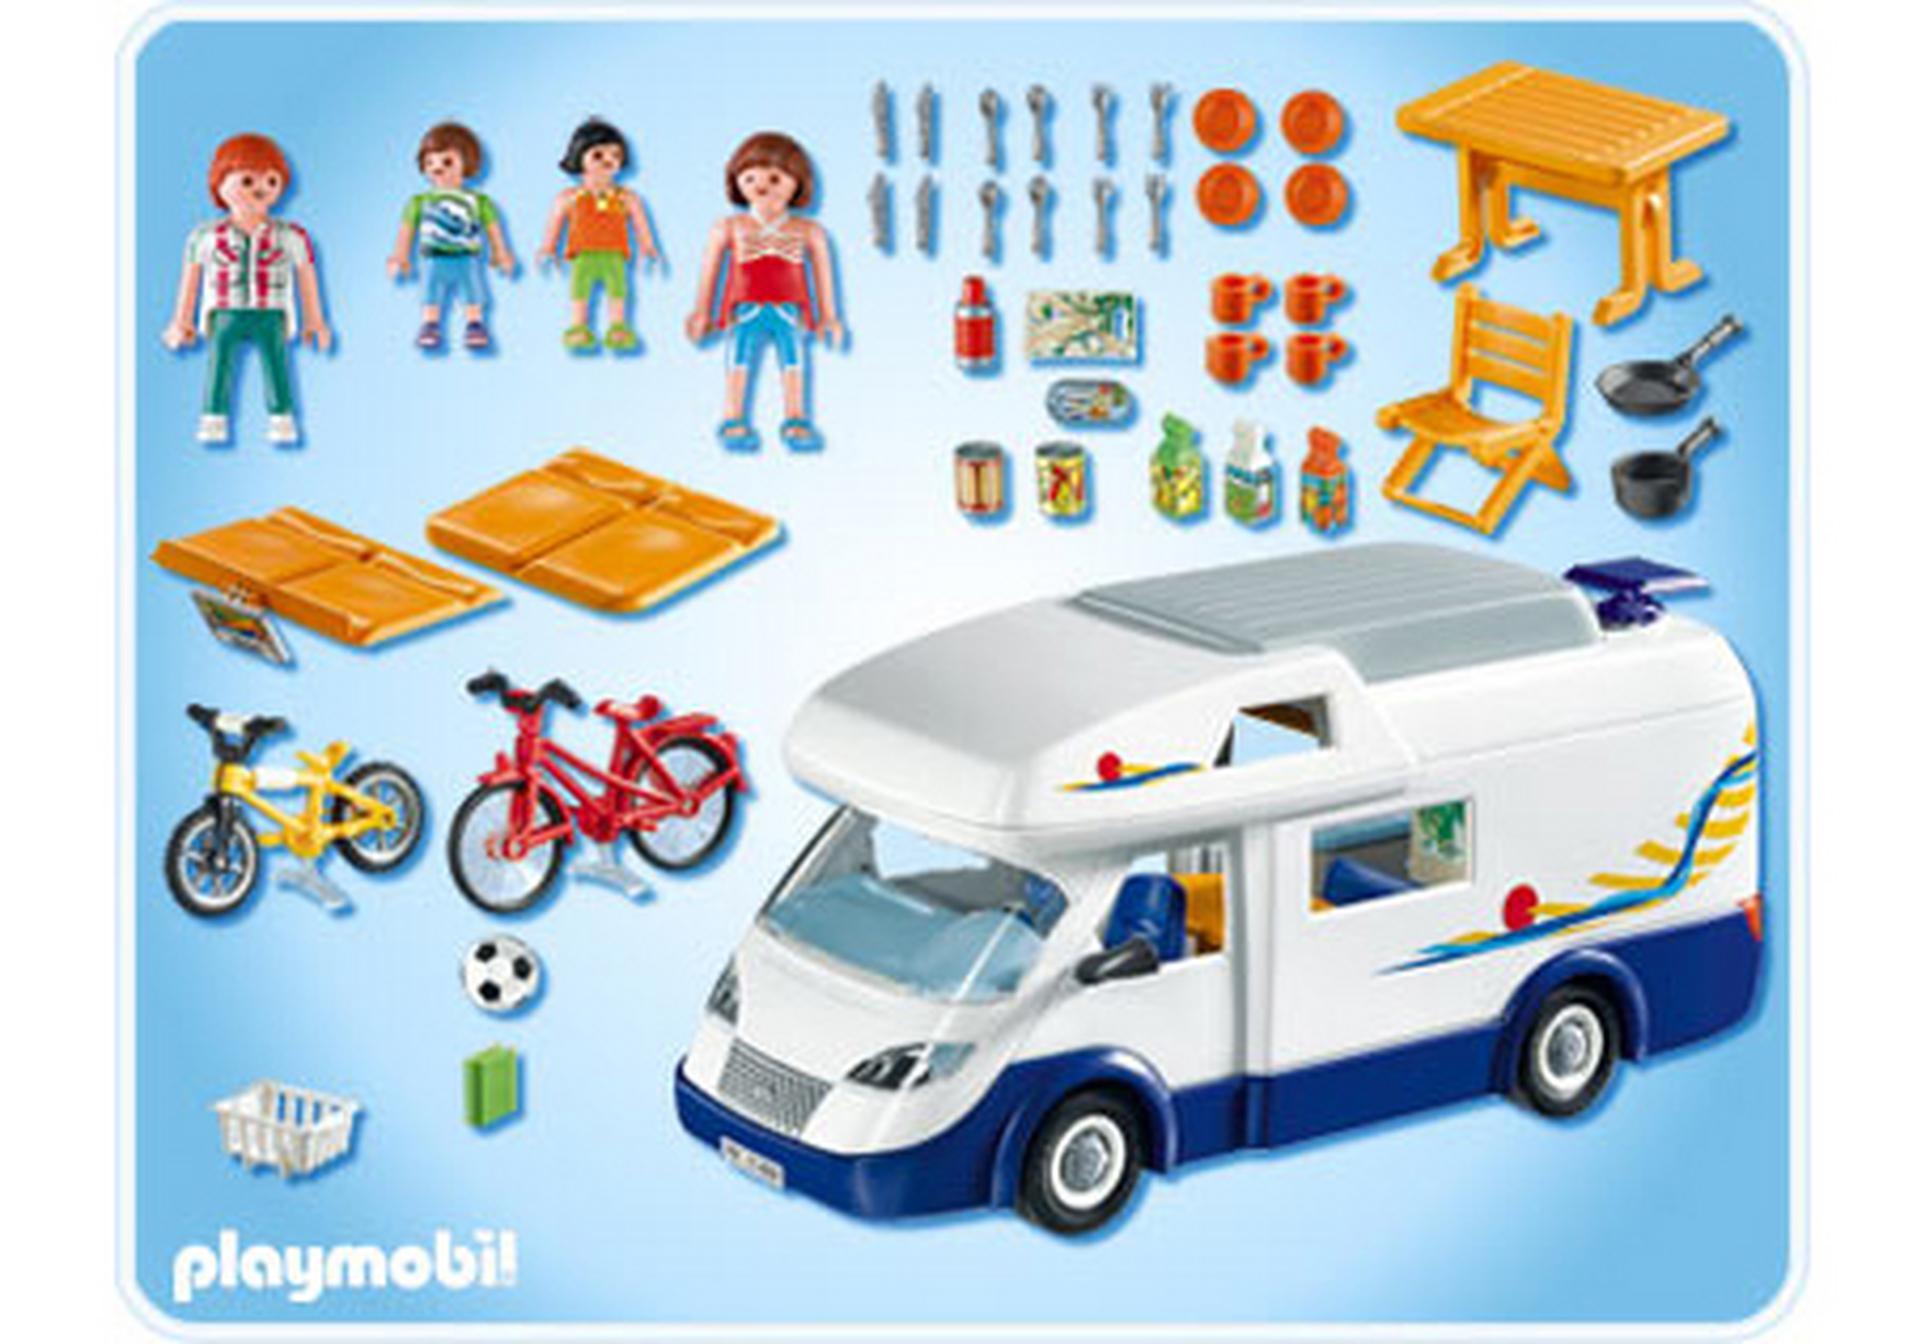 Grand camping car familial 4859 a playmobil france - Camping car playmobil pas cher ...